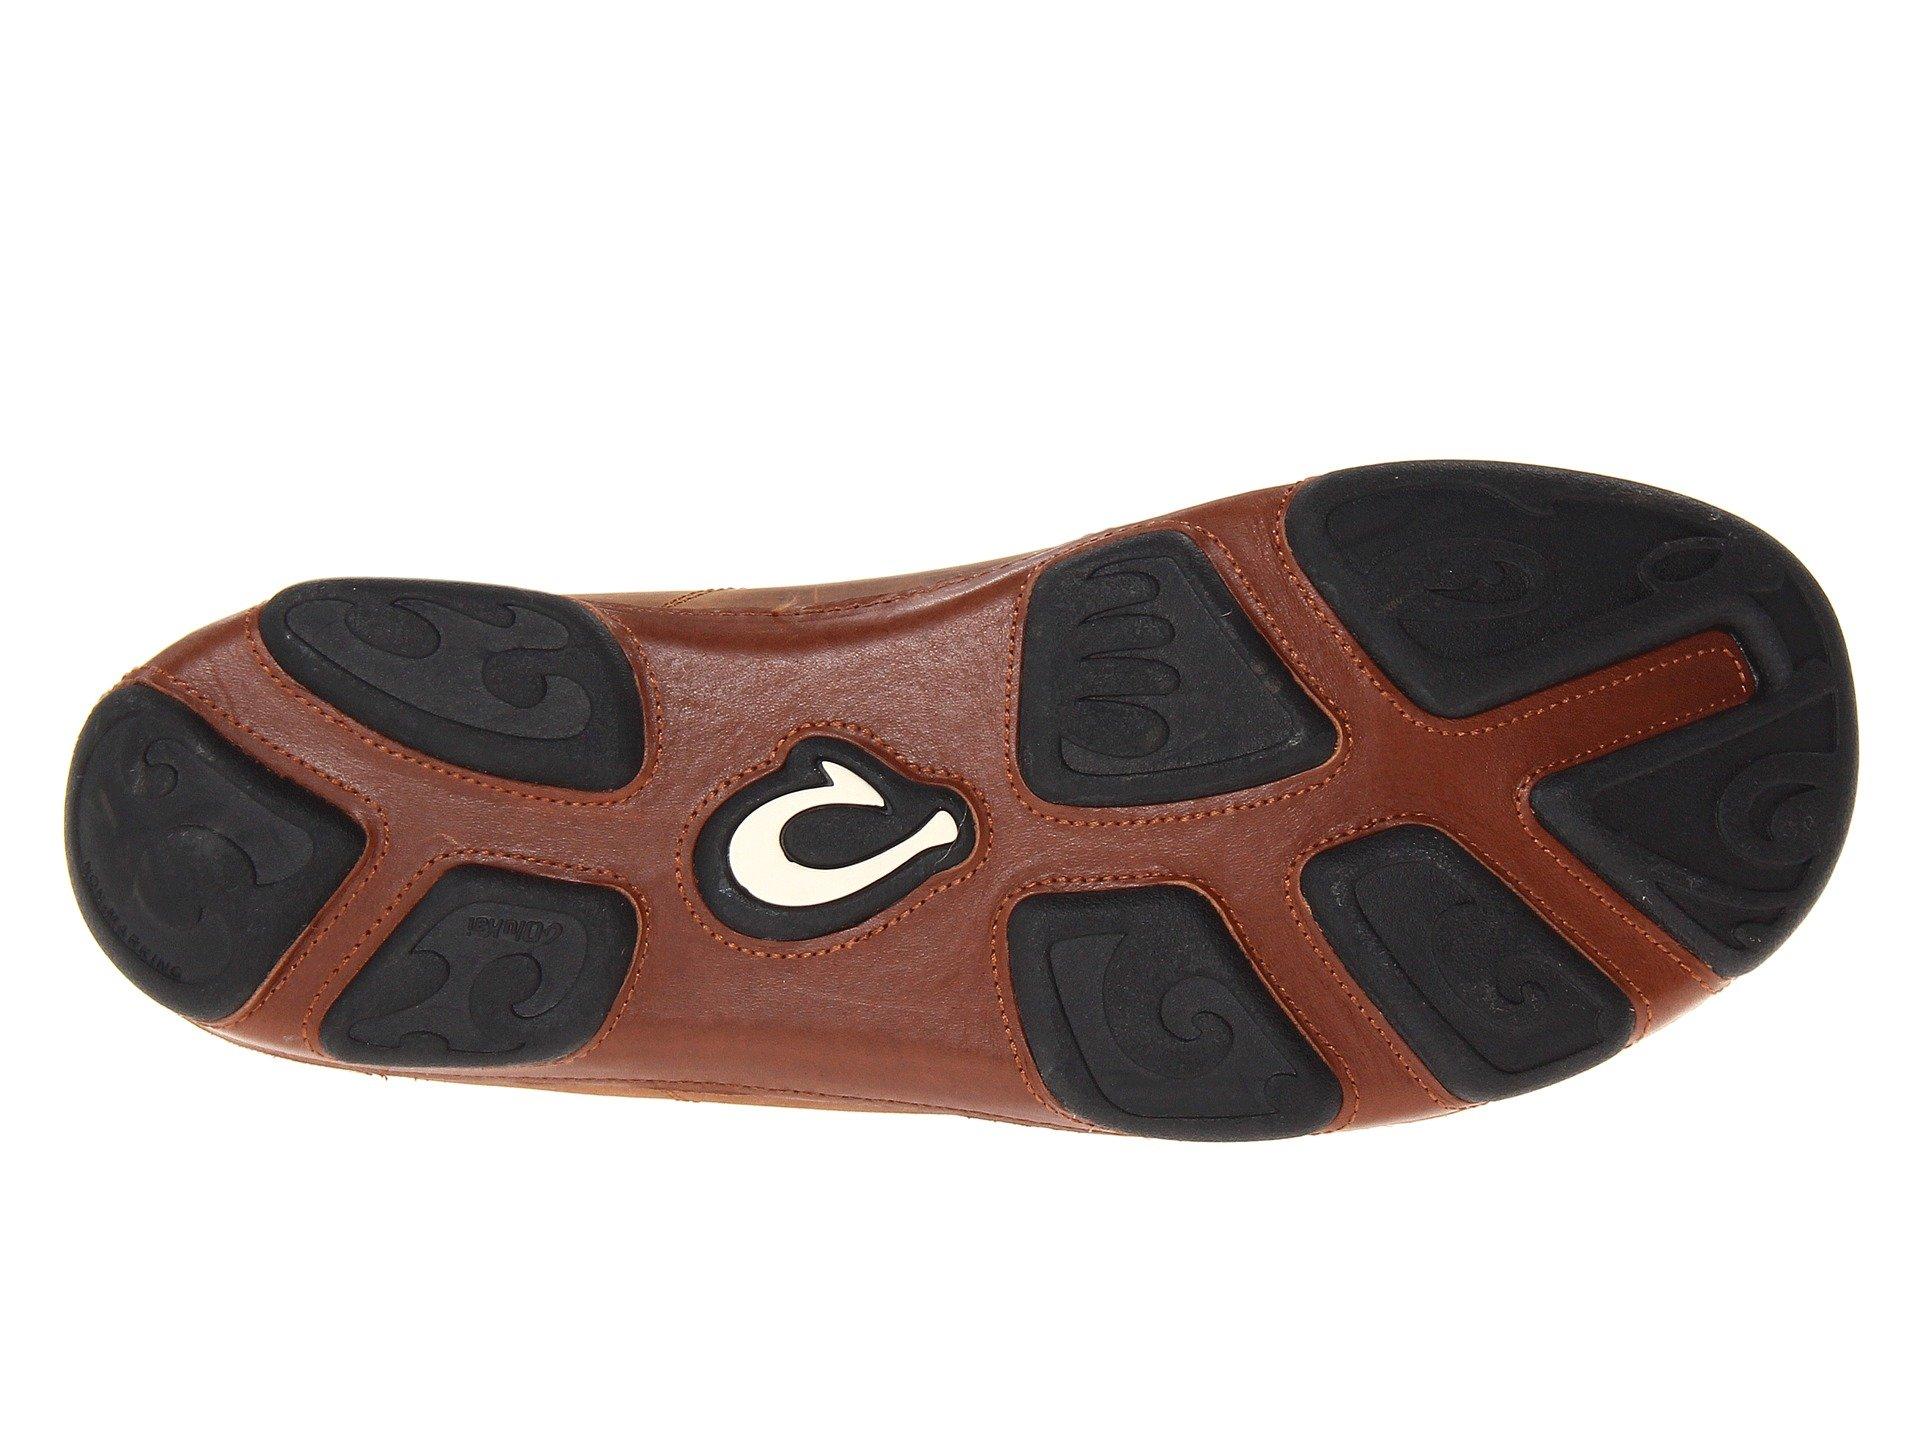 OluKai 'Ohana Lace-Up Nubuck Shoe - Men's Henna/Toffee 13